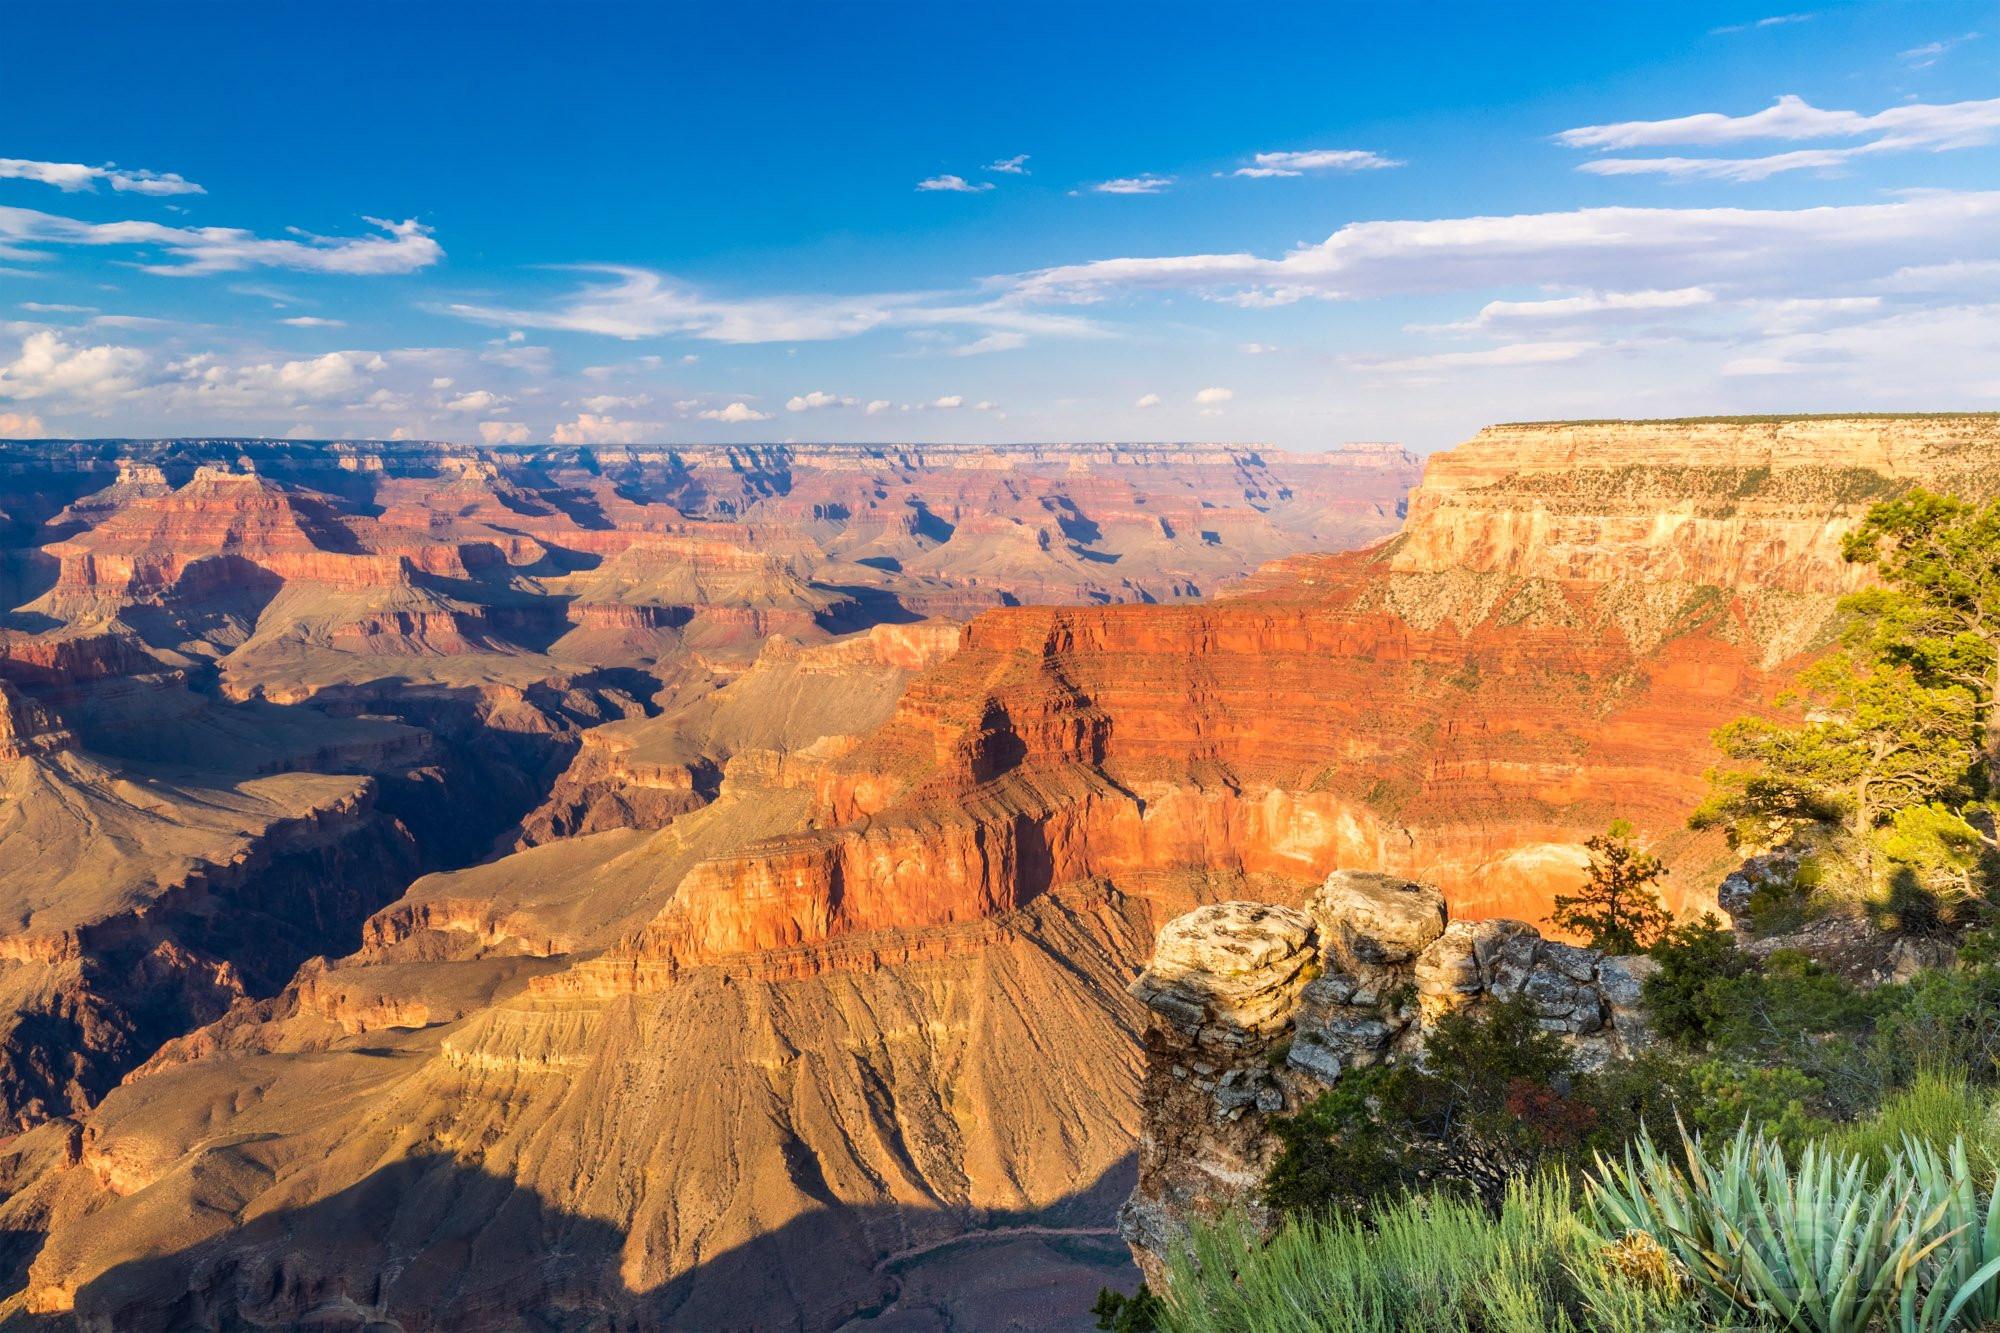 Sunset on the Grand Canyon, Arizona USA